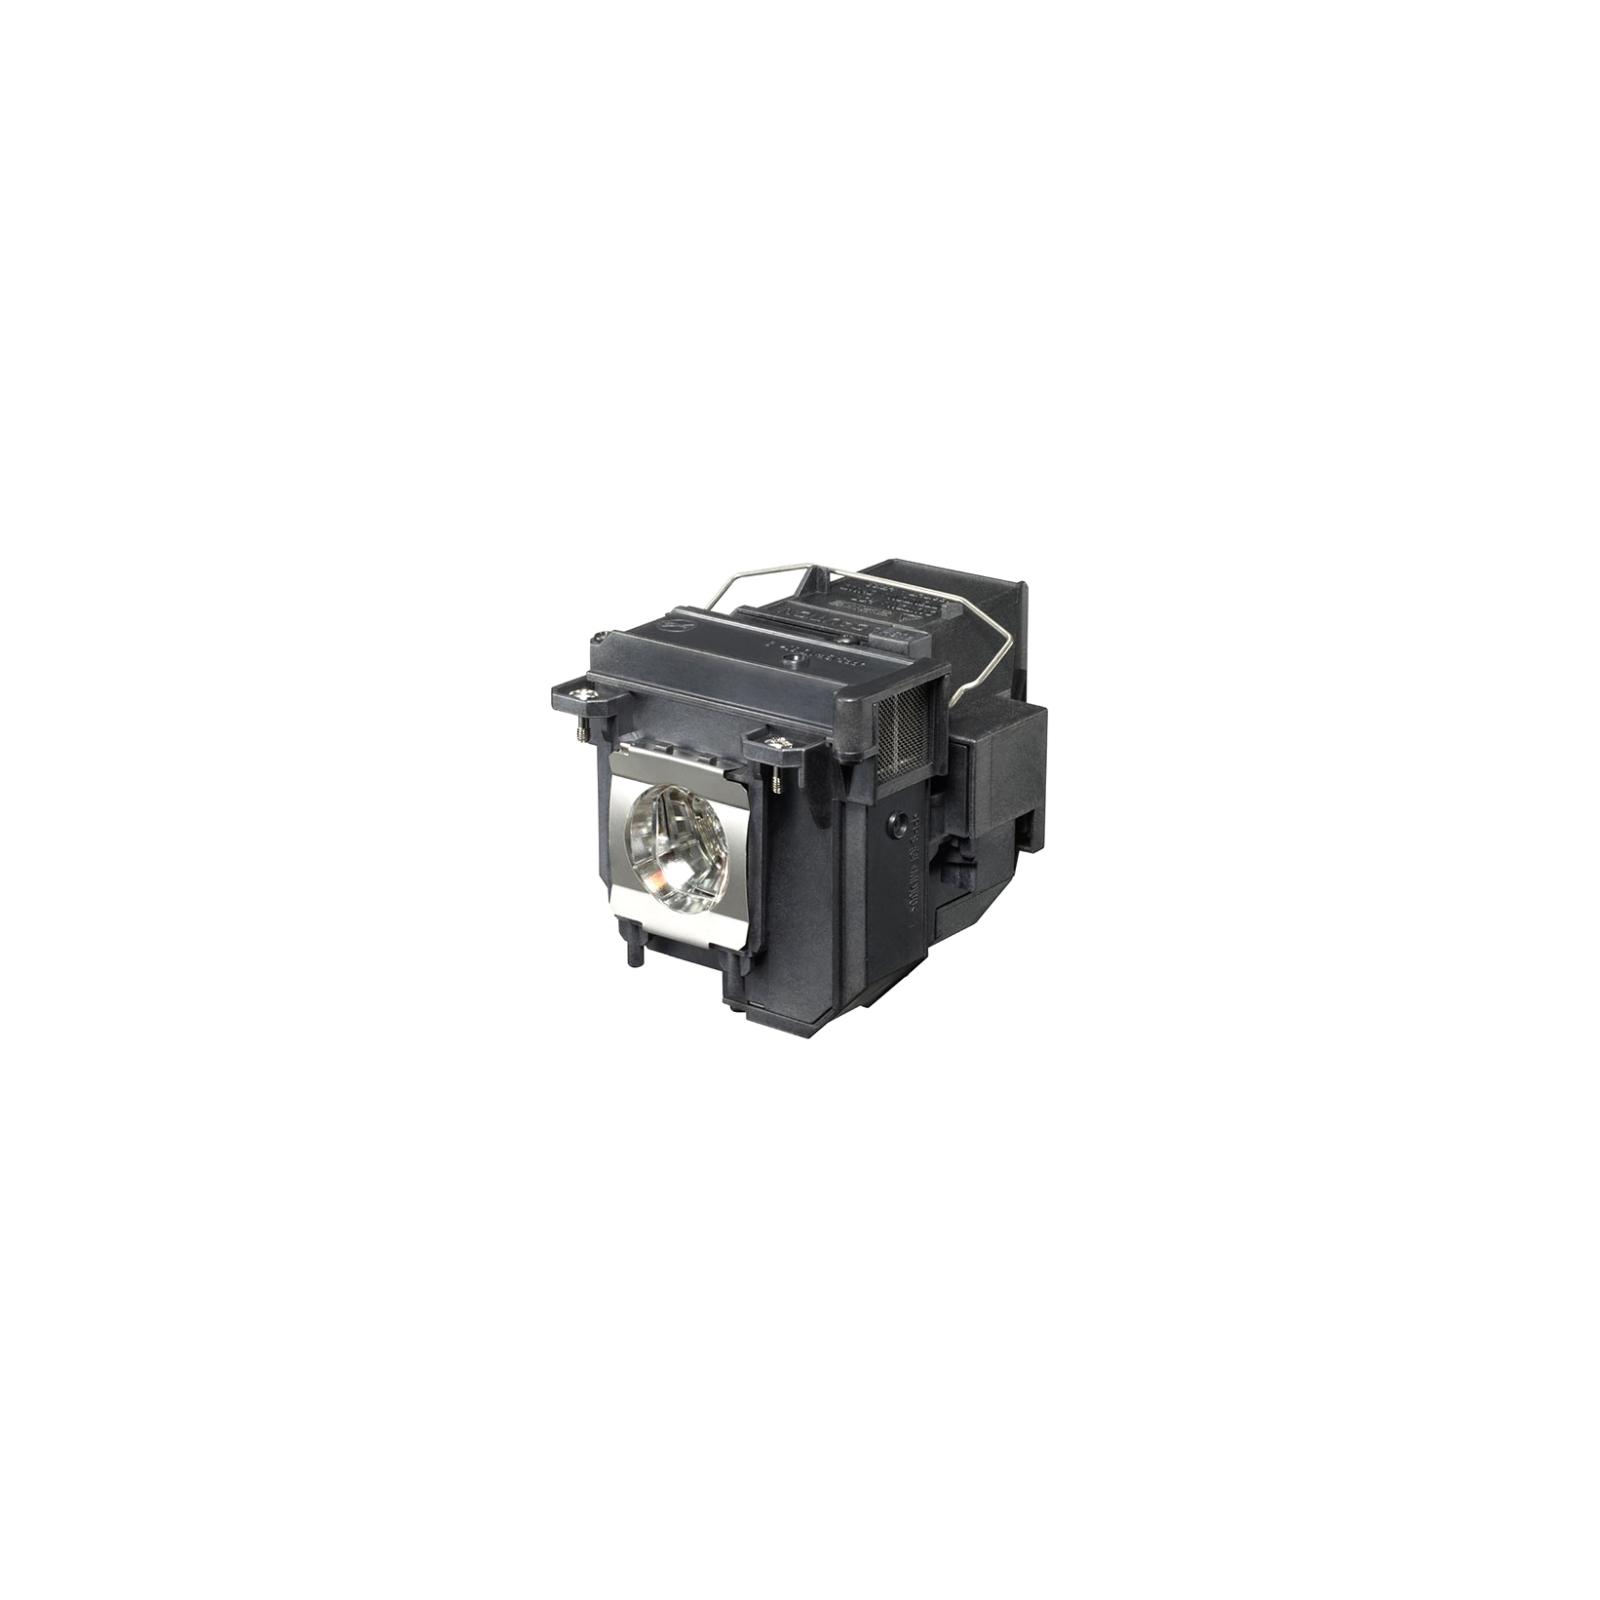 Лампа проектора EPSON L71 (V13H010L71)